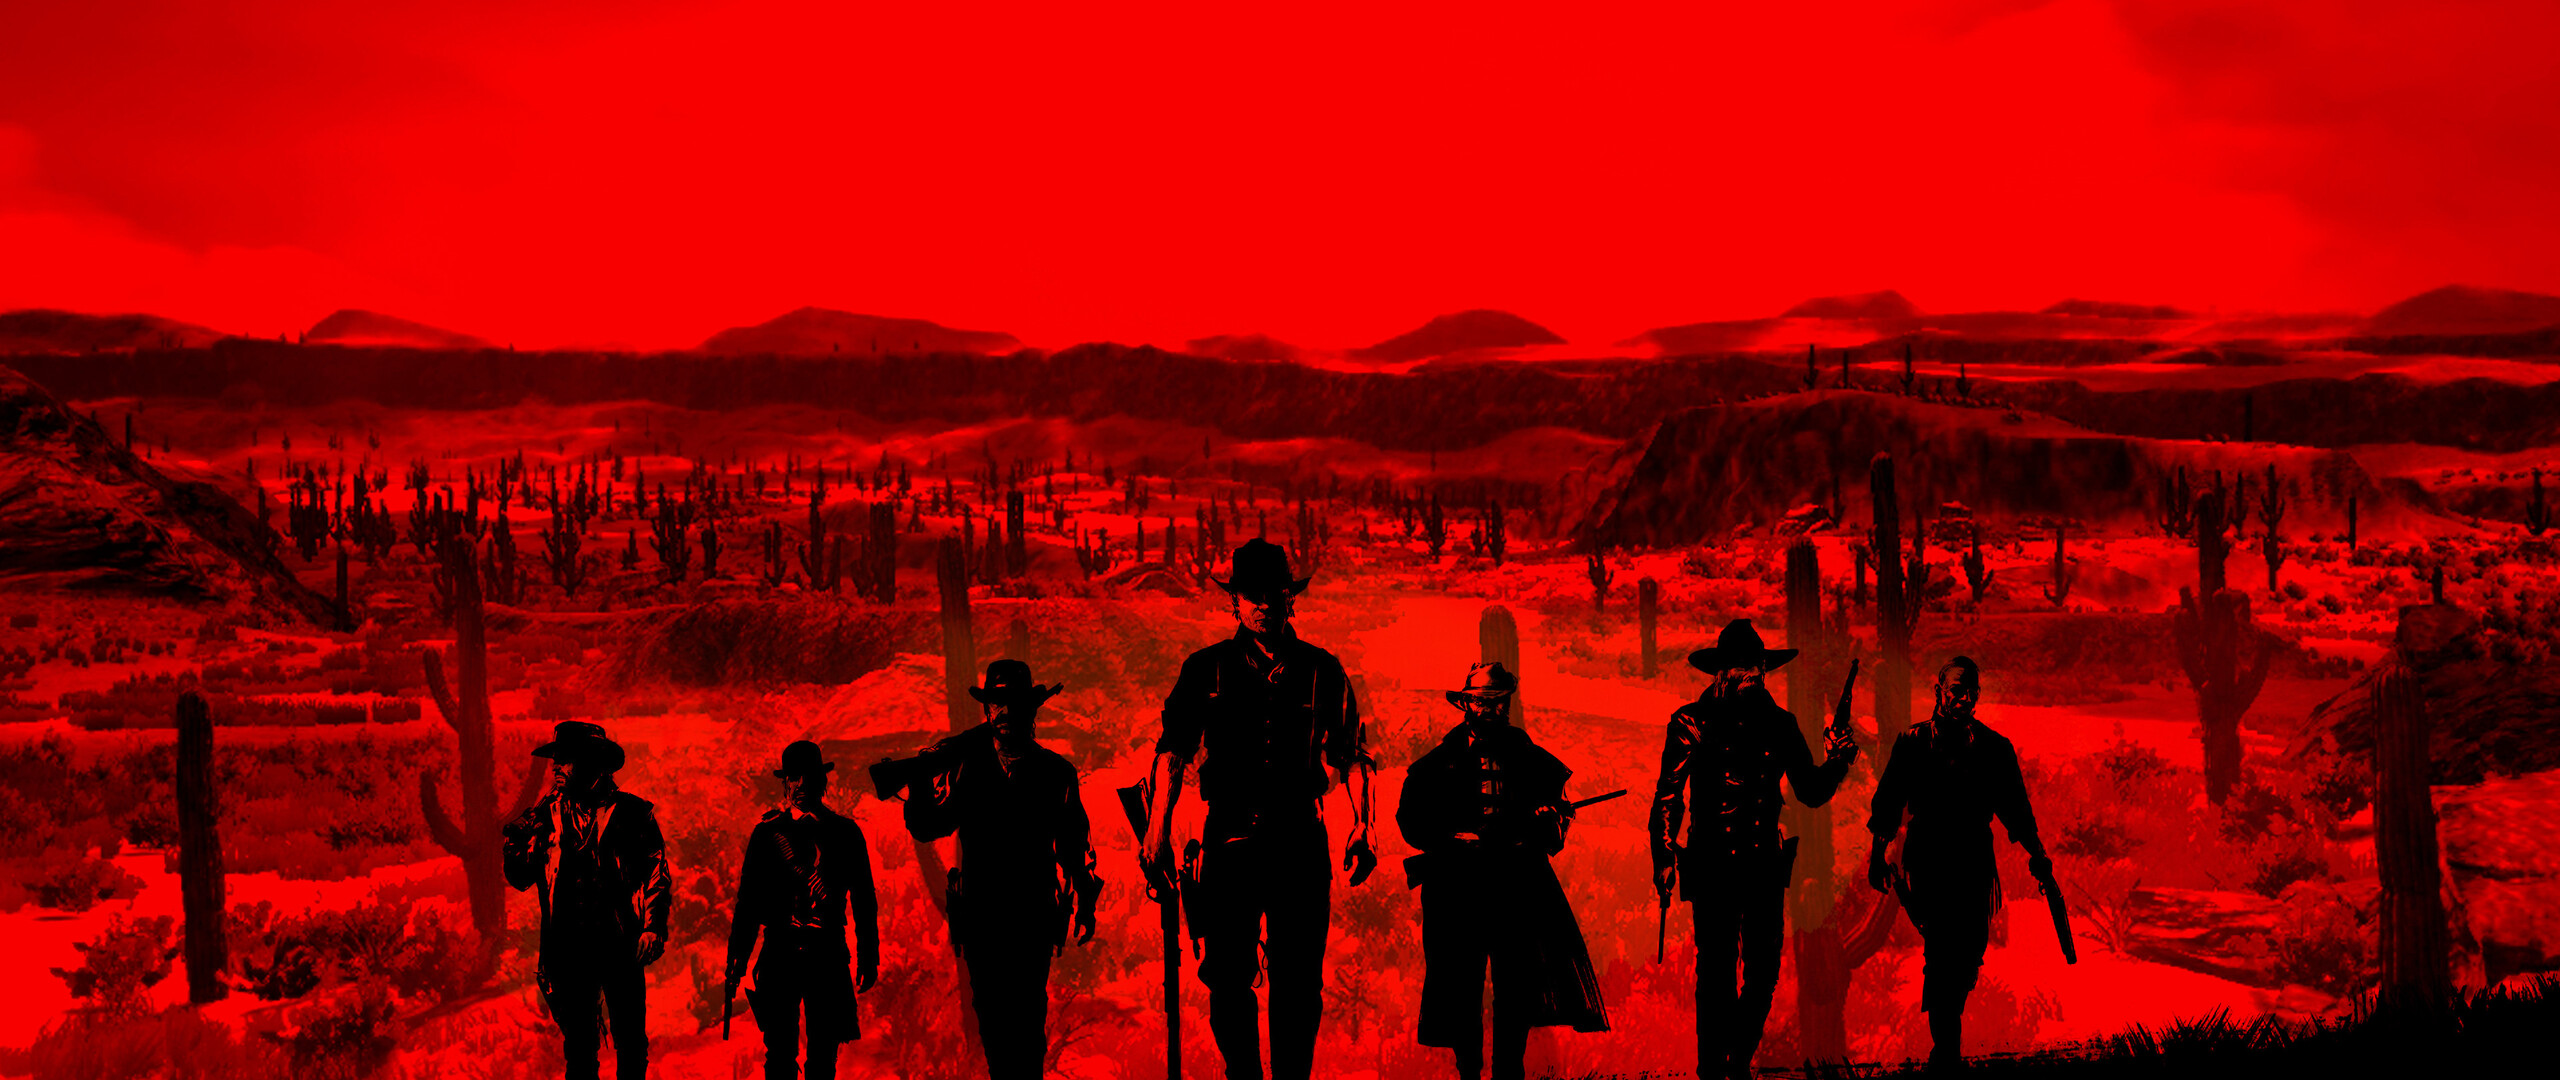 2560x1080 Red Dead Redemption 2 4k 2560x1080 Resolution Hd